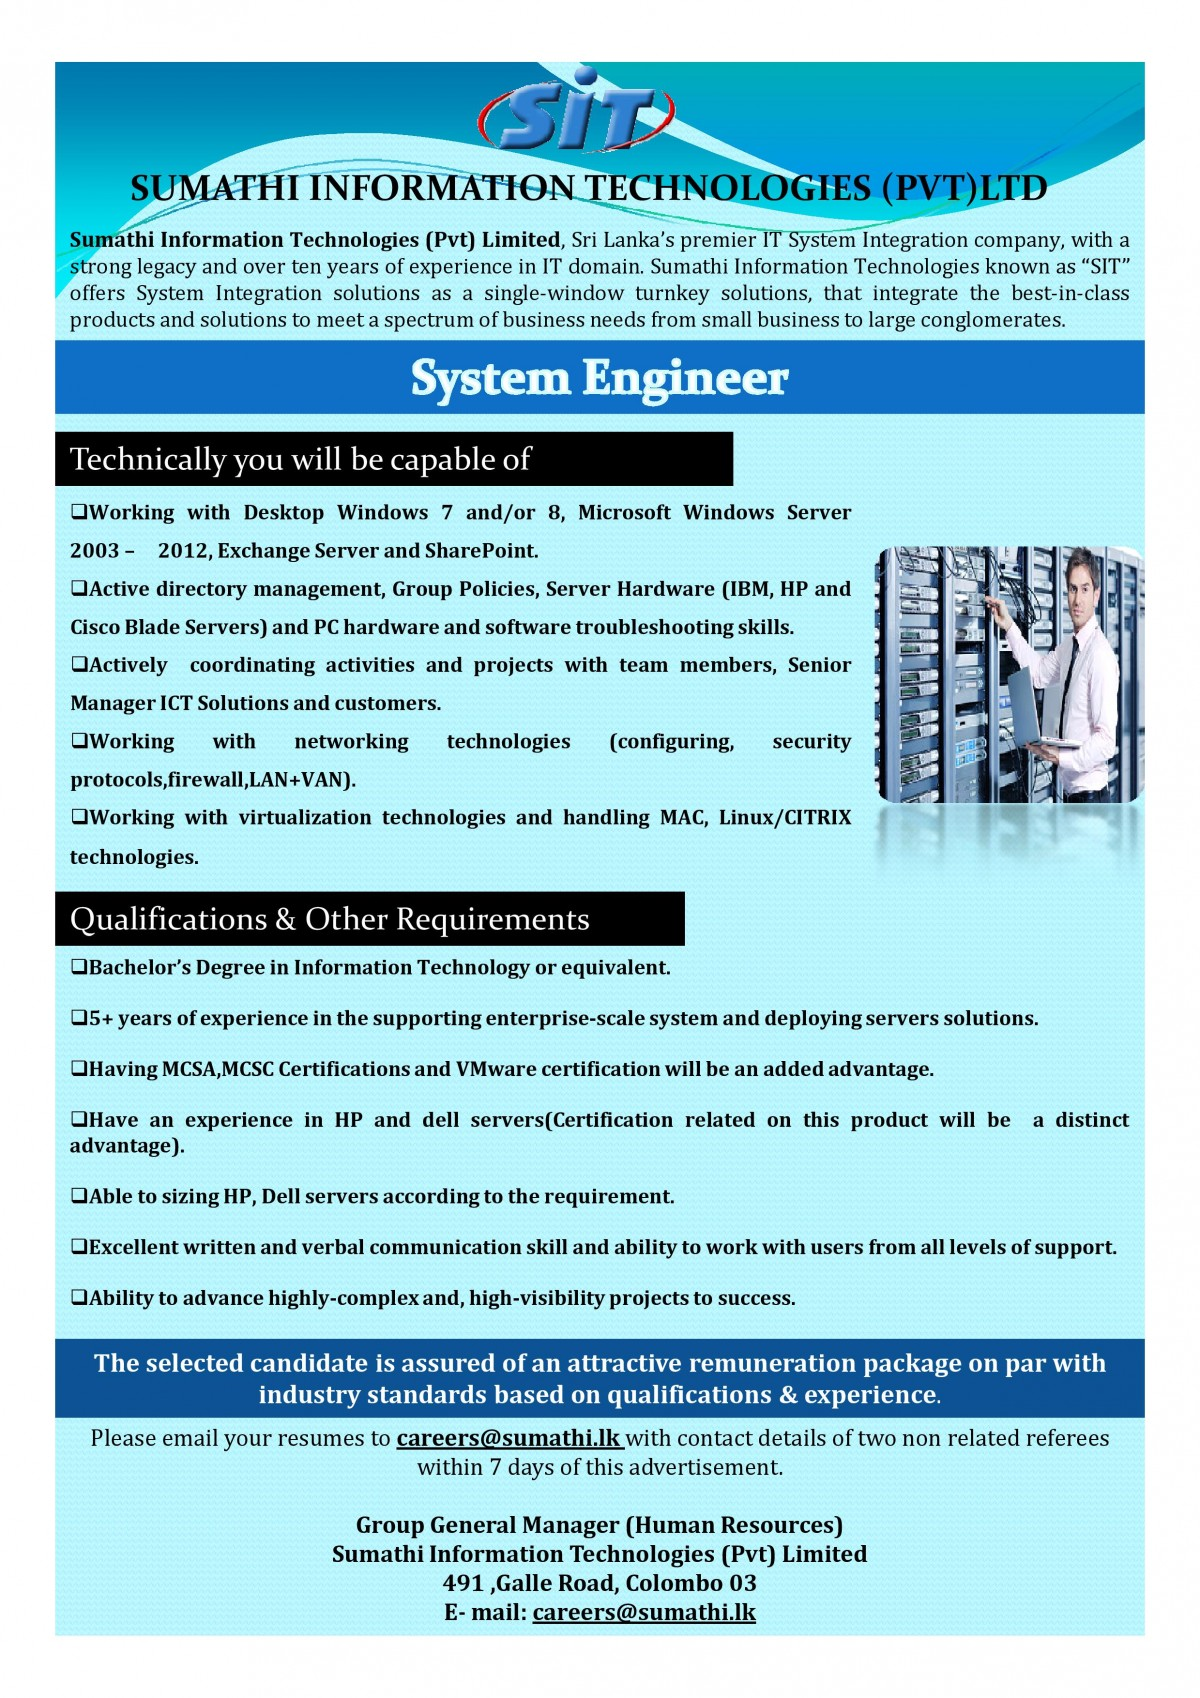 System Engineer Job Vacancy In Sri Lanka